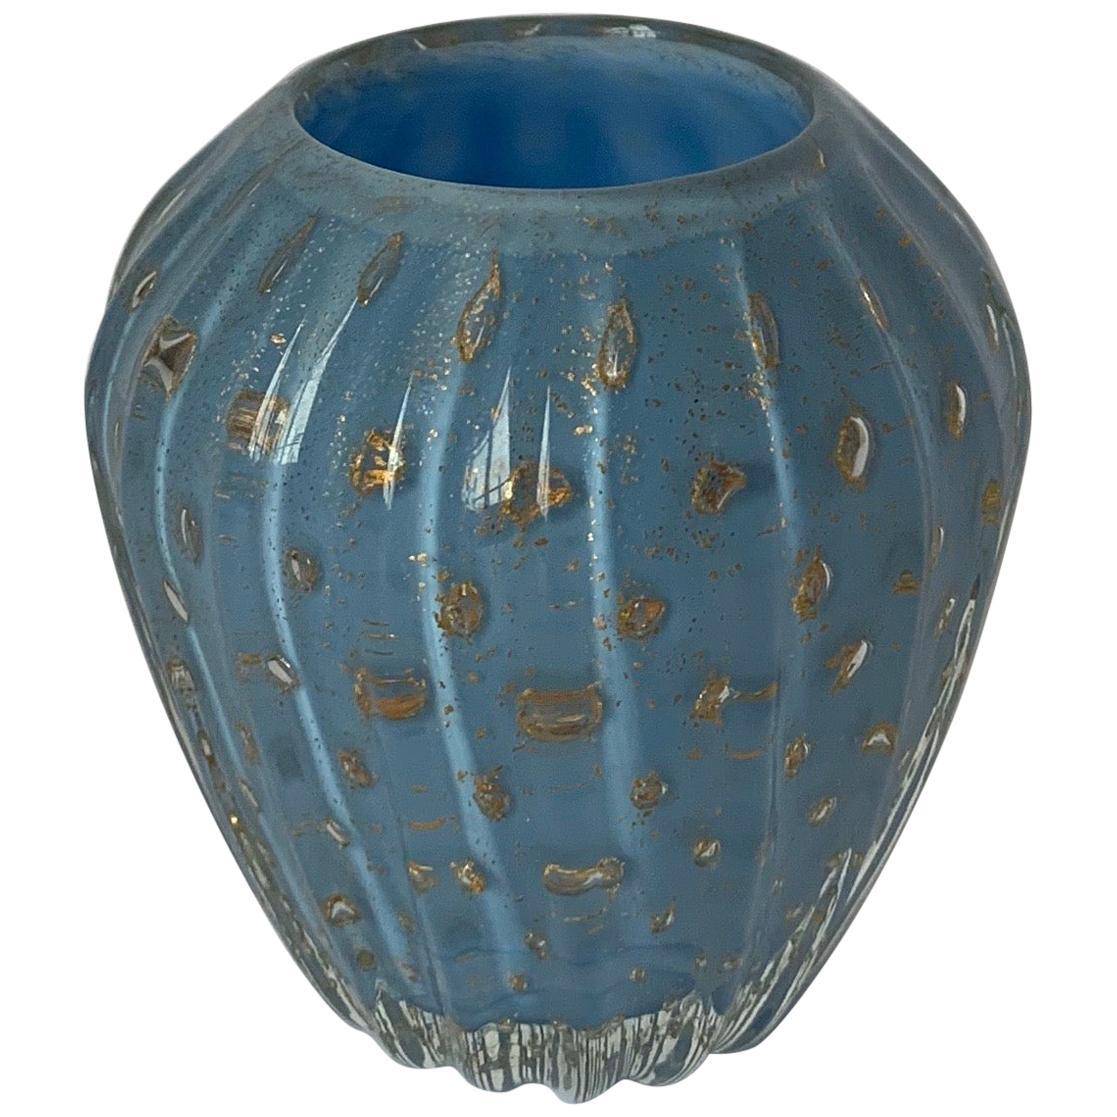 Murano Blue Bud Vase Attributed to Barbini